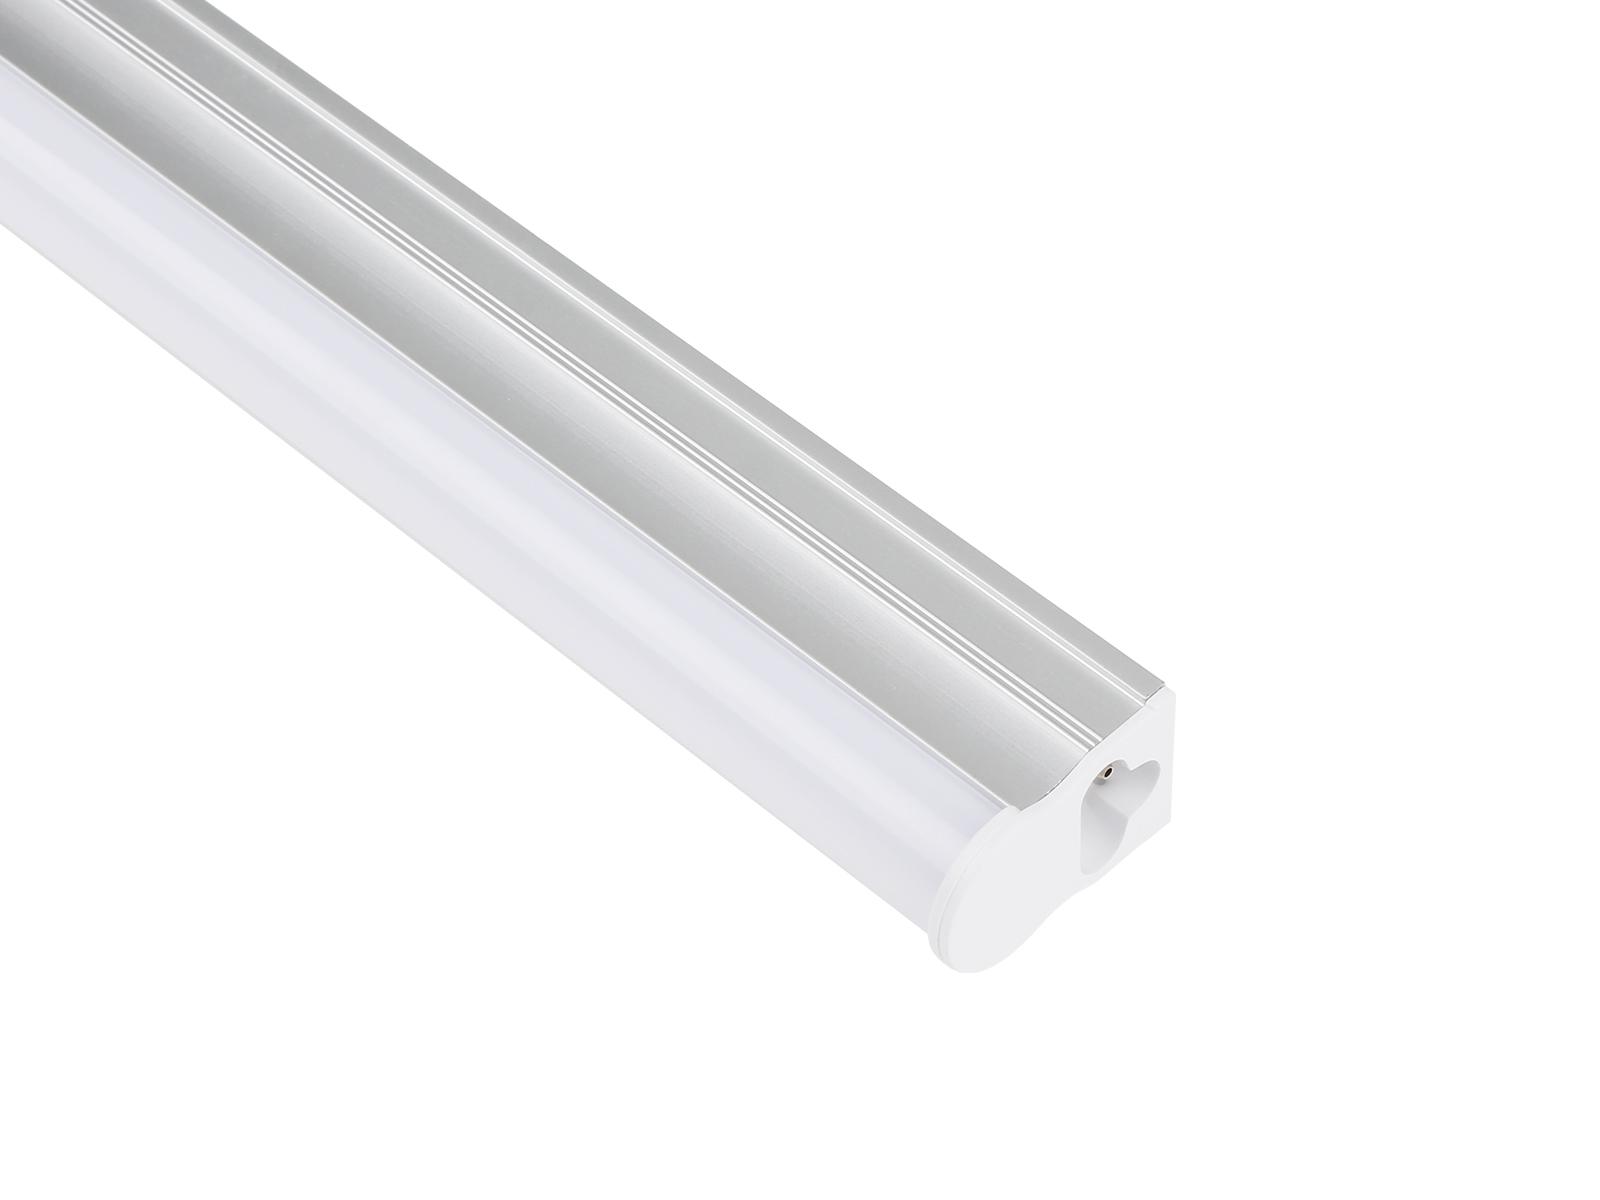 tube uk white cool co light dp fluorescent electronics amazon